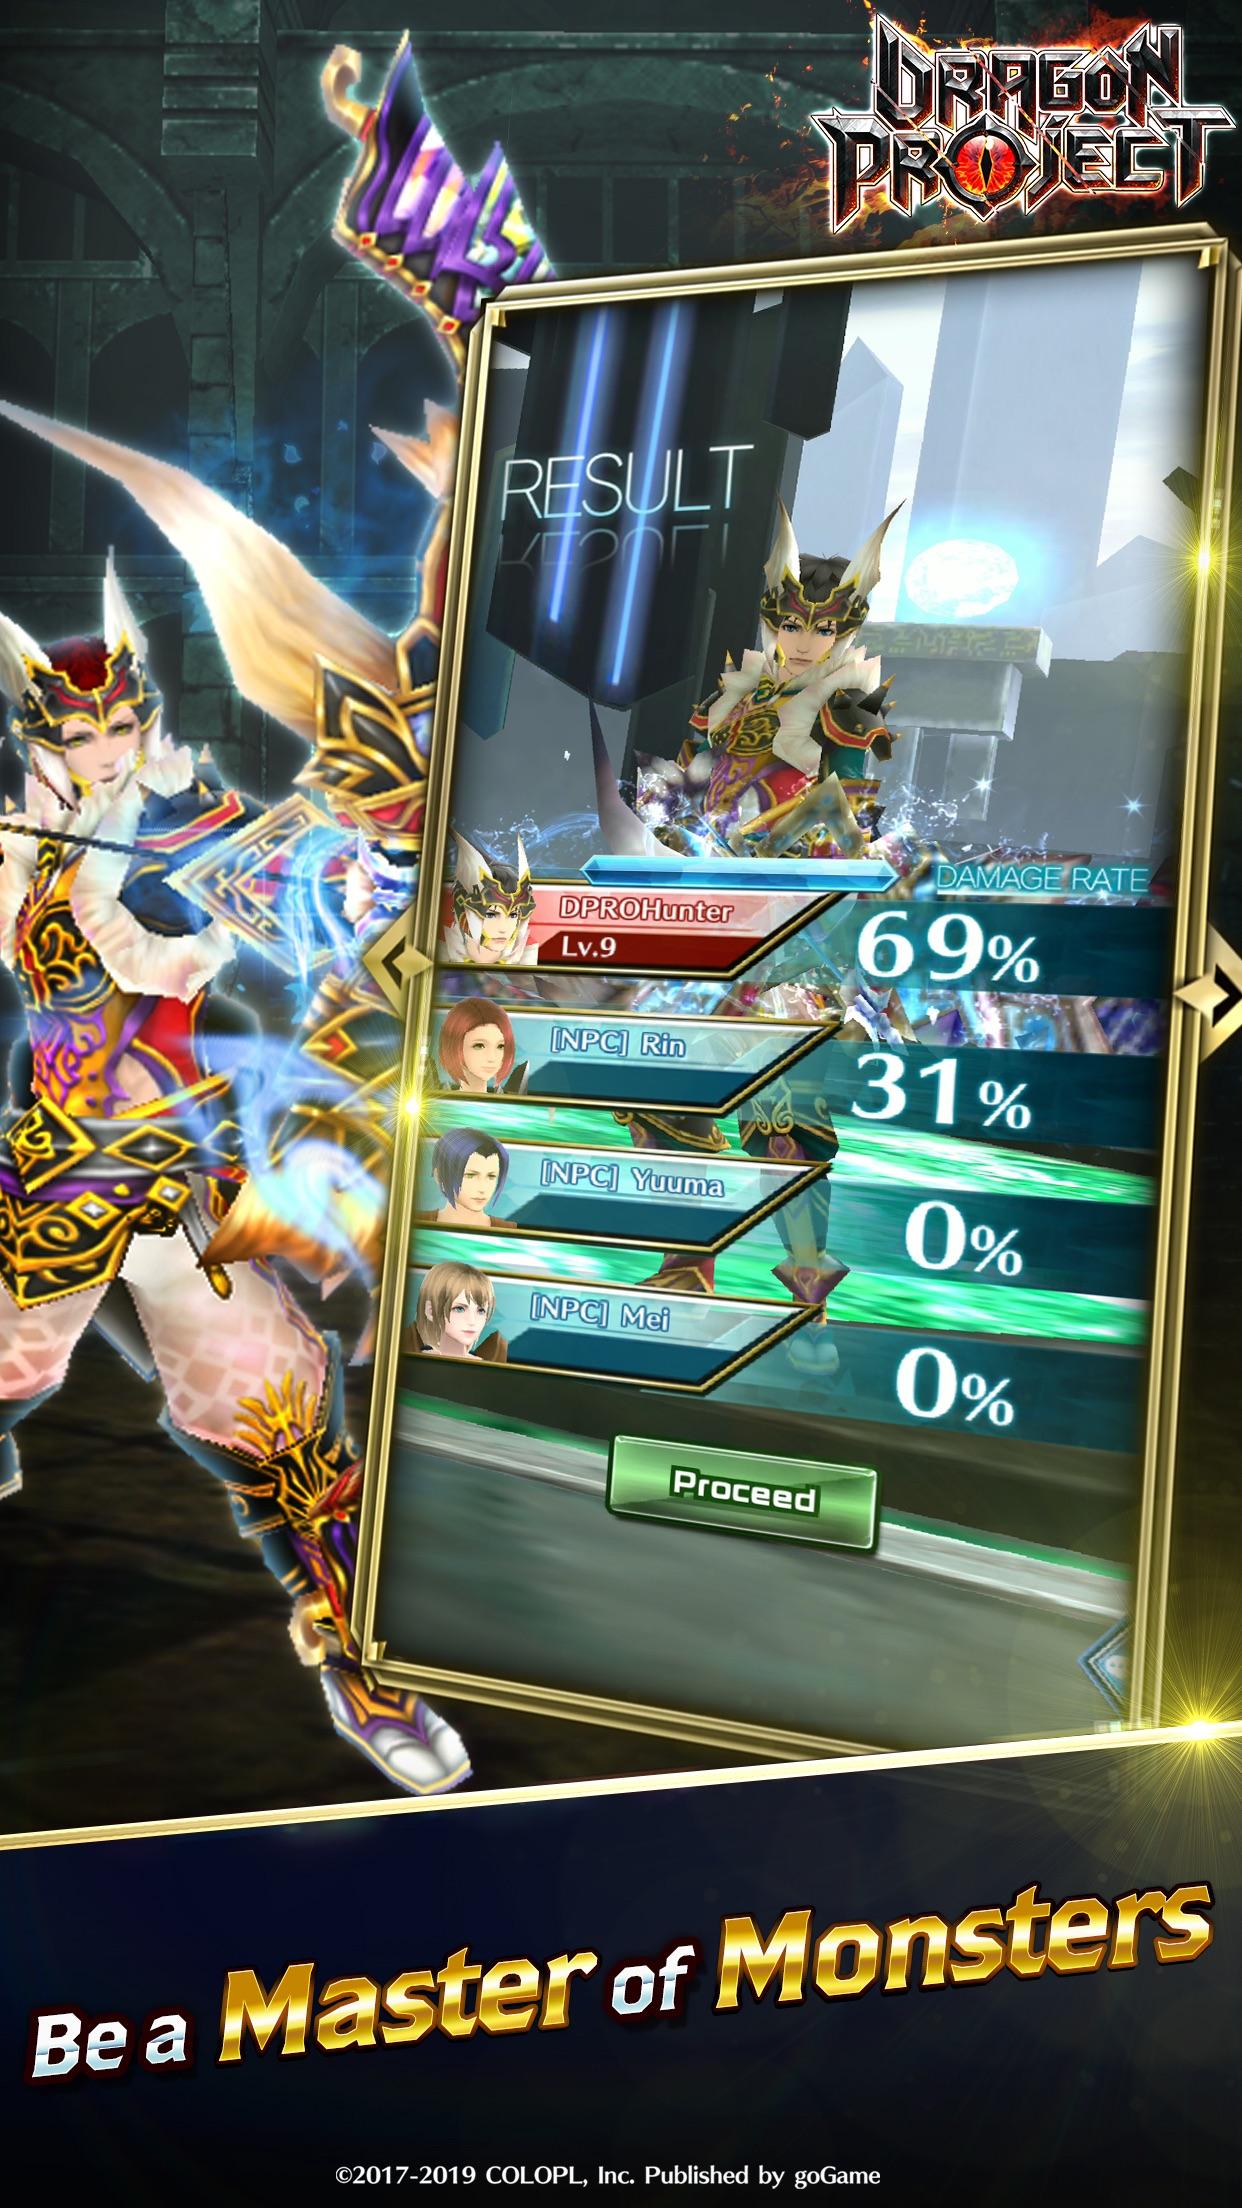 Dragon Project Screenshot